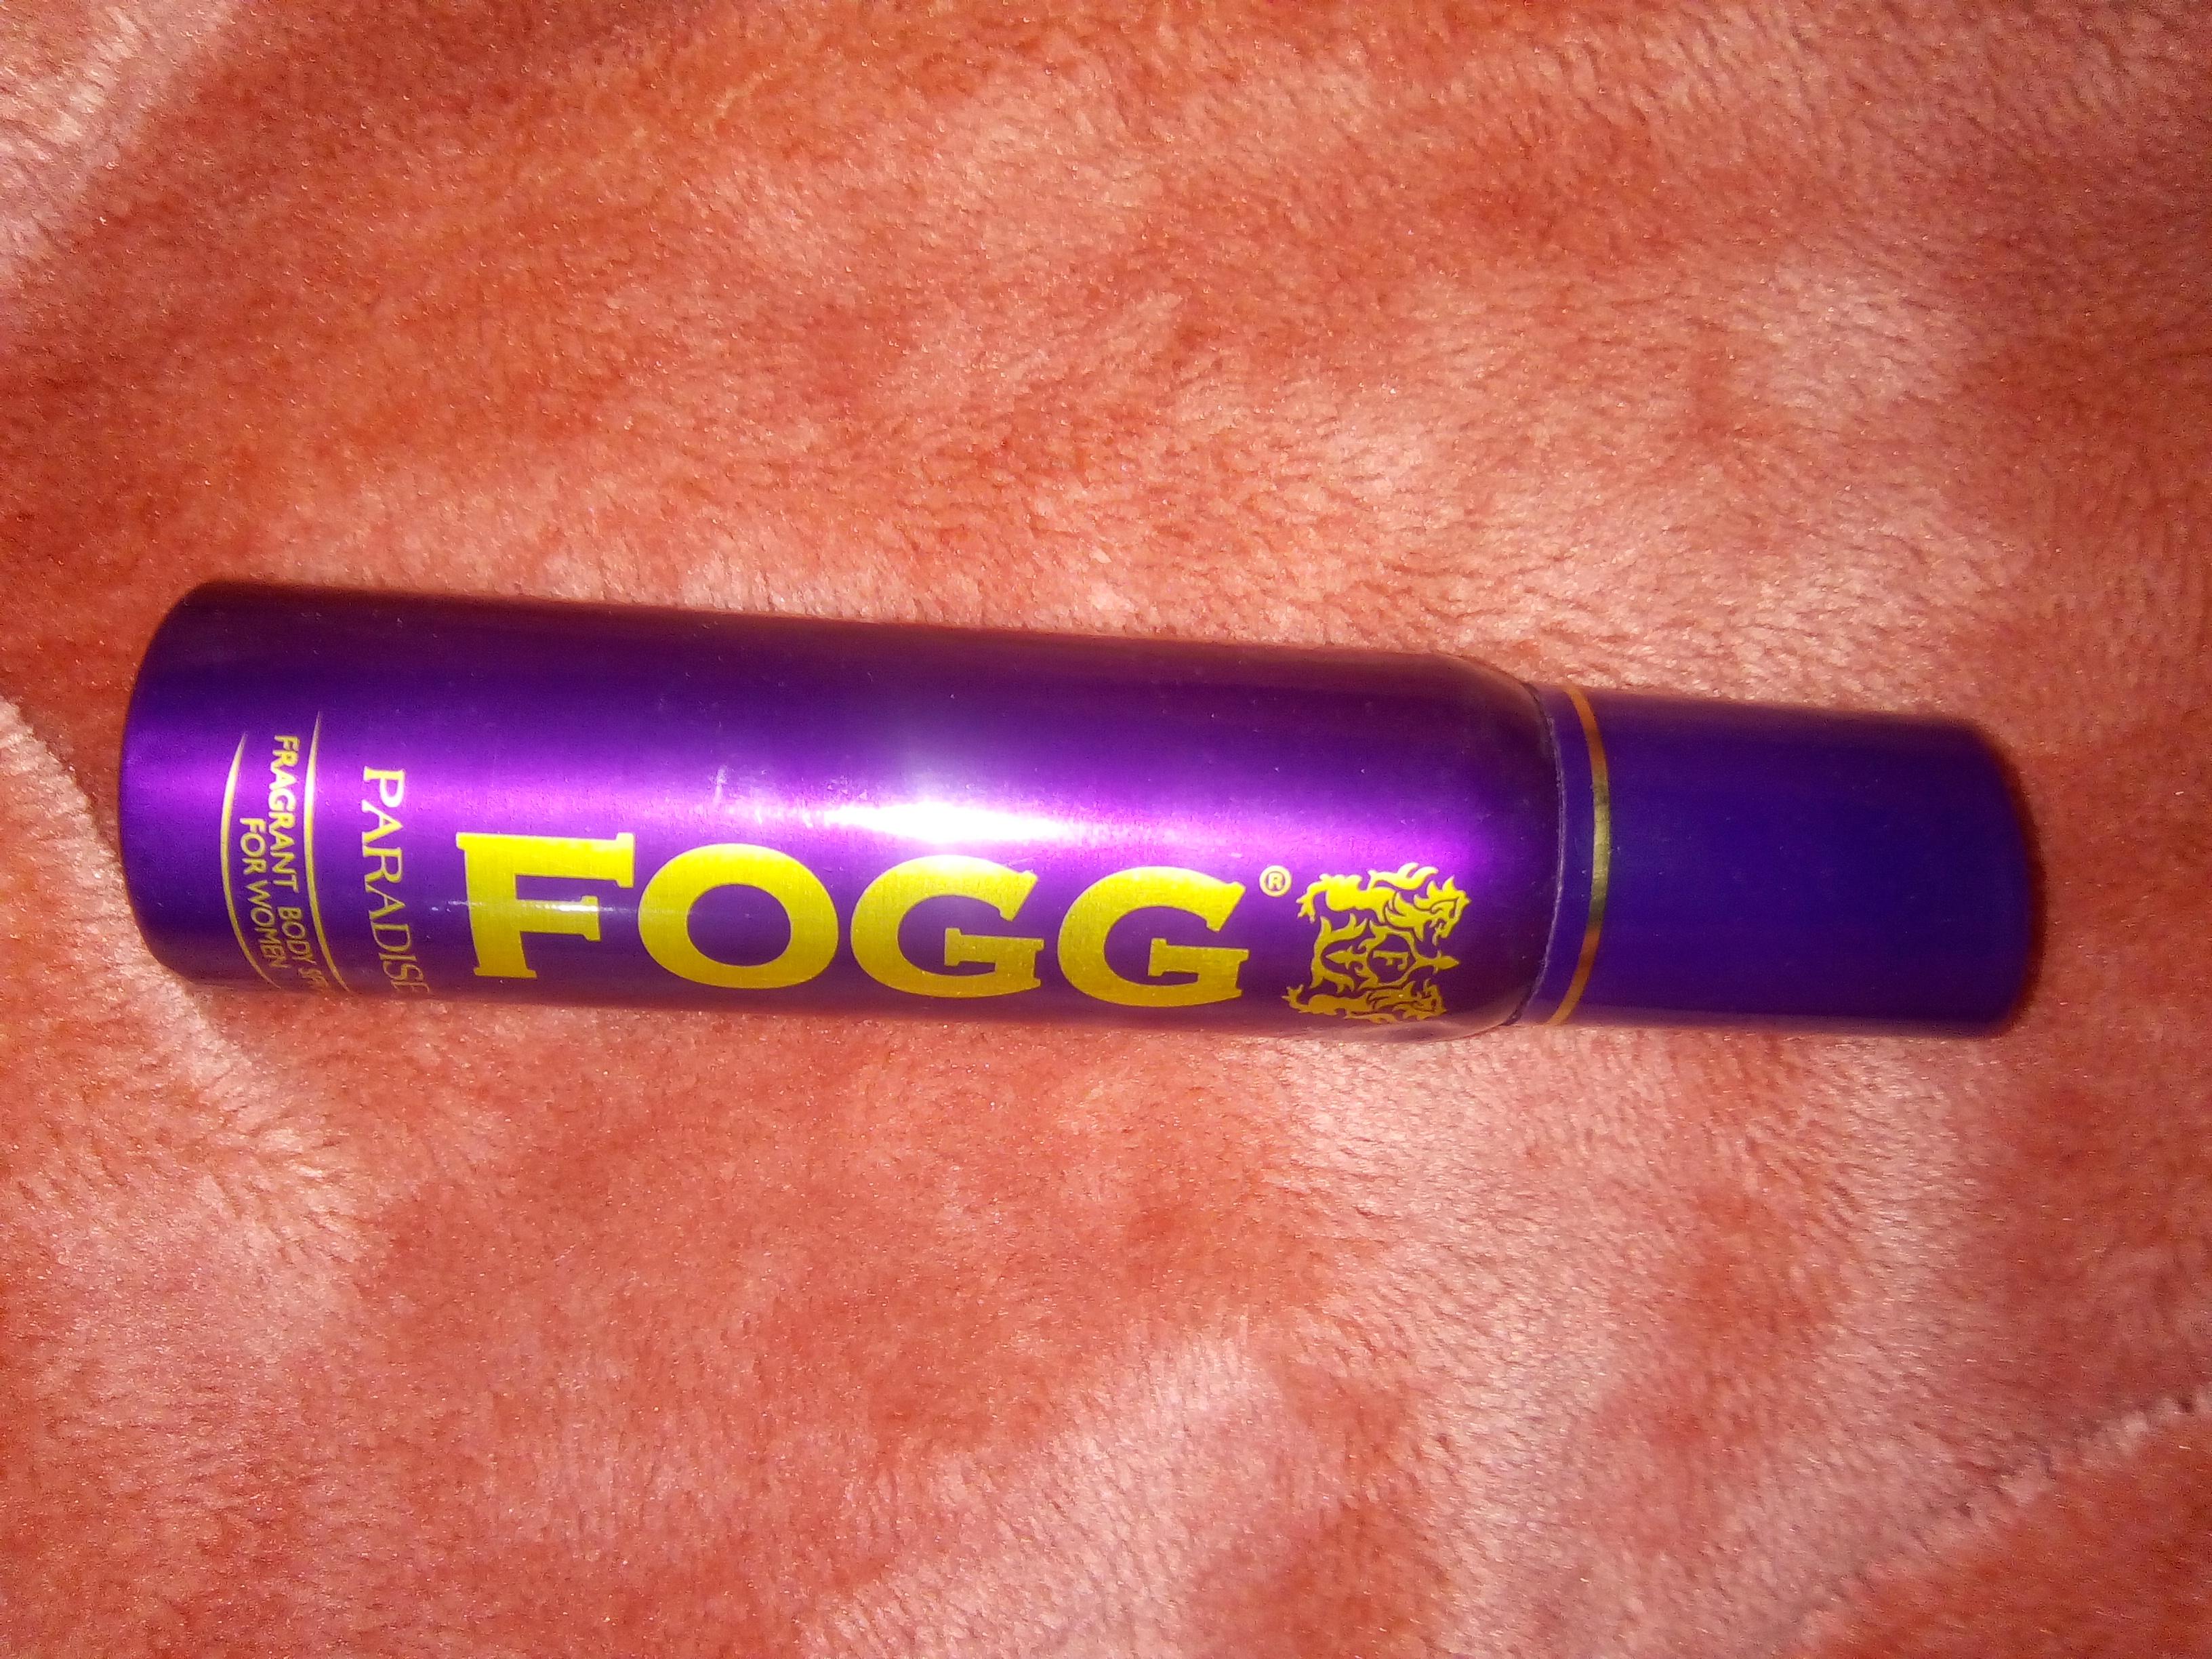 Fogg Paradise Body Spray For Women-Fogg Paradise Body Spray For Women-By aflyingsoul